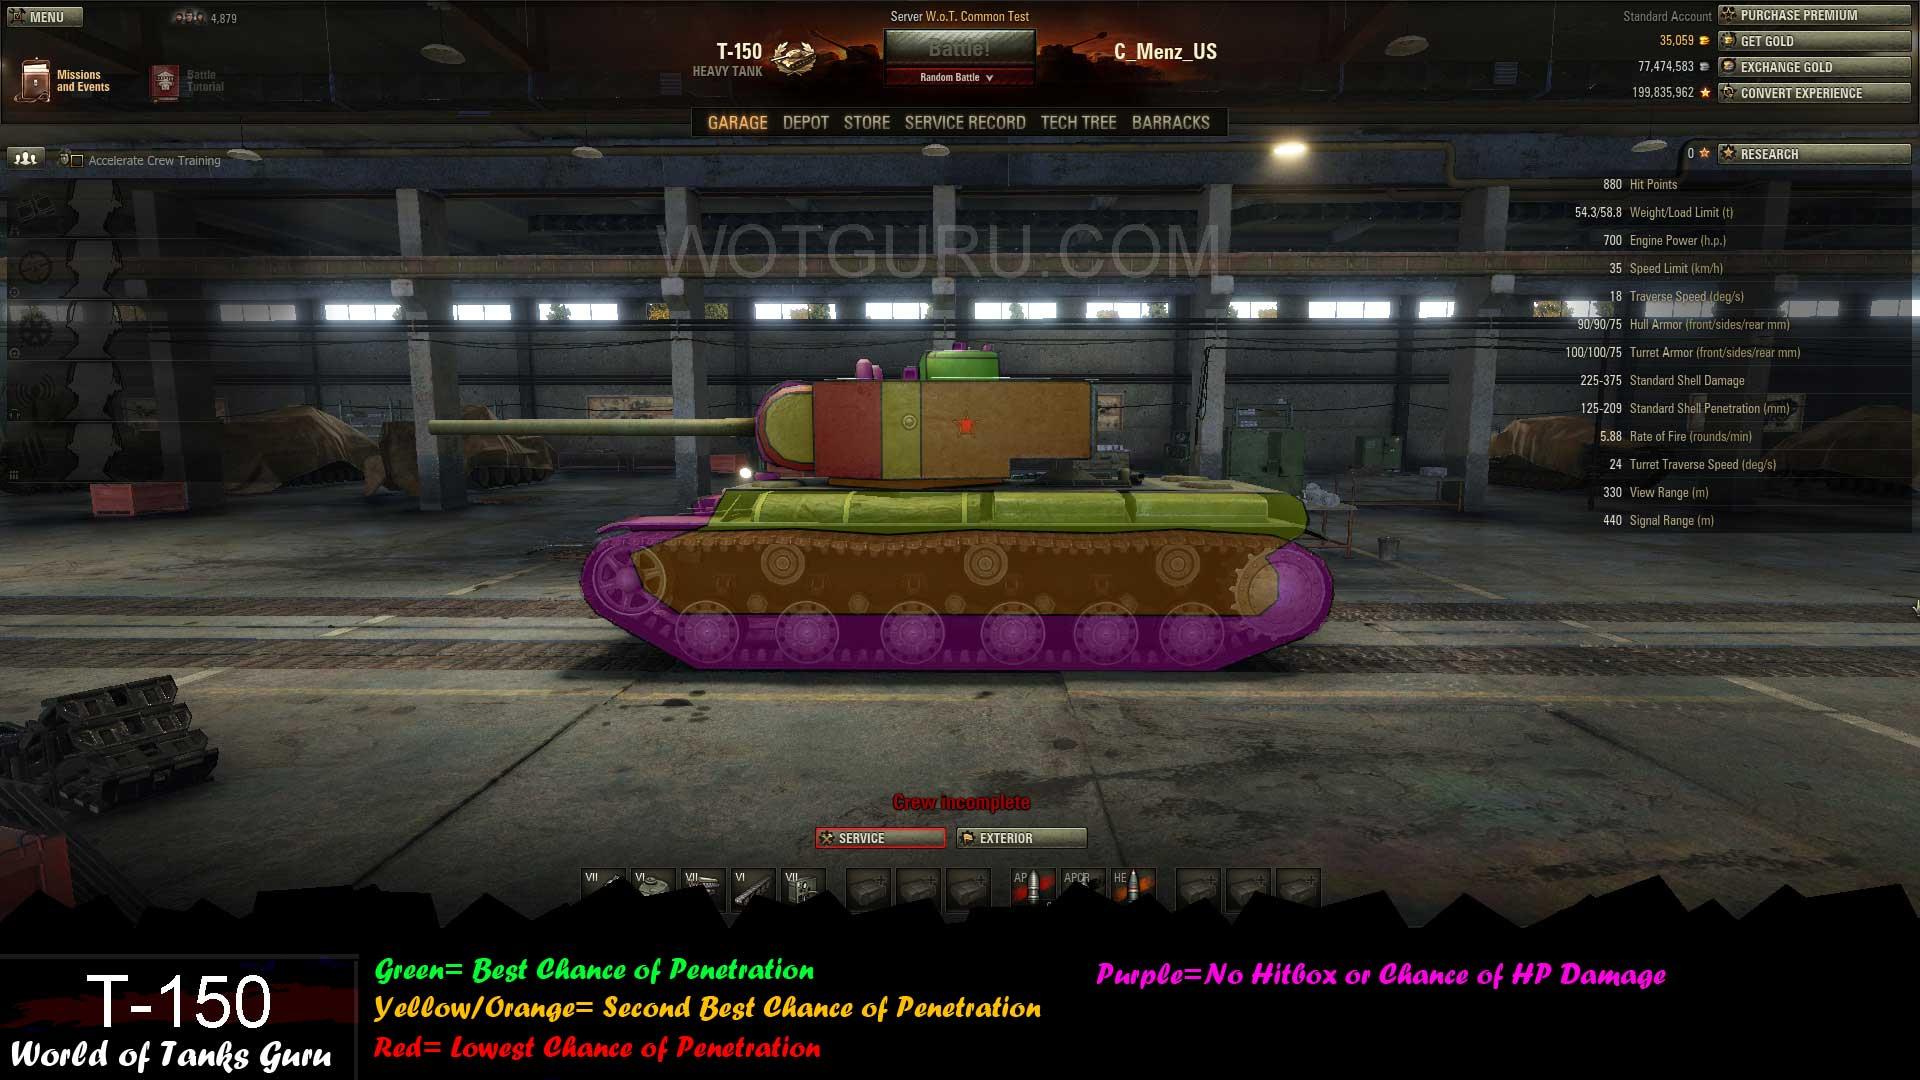 world of tanks kv-5 matchmaking